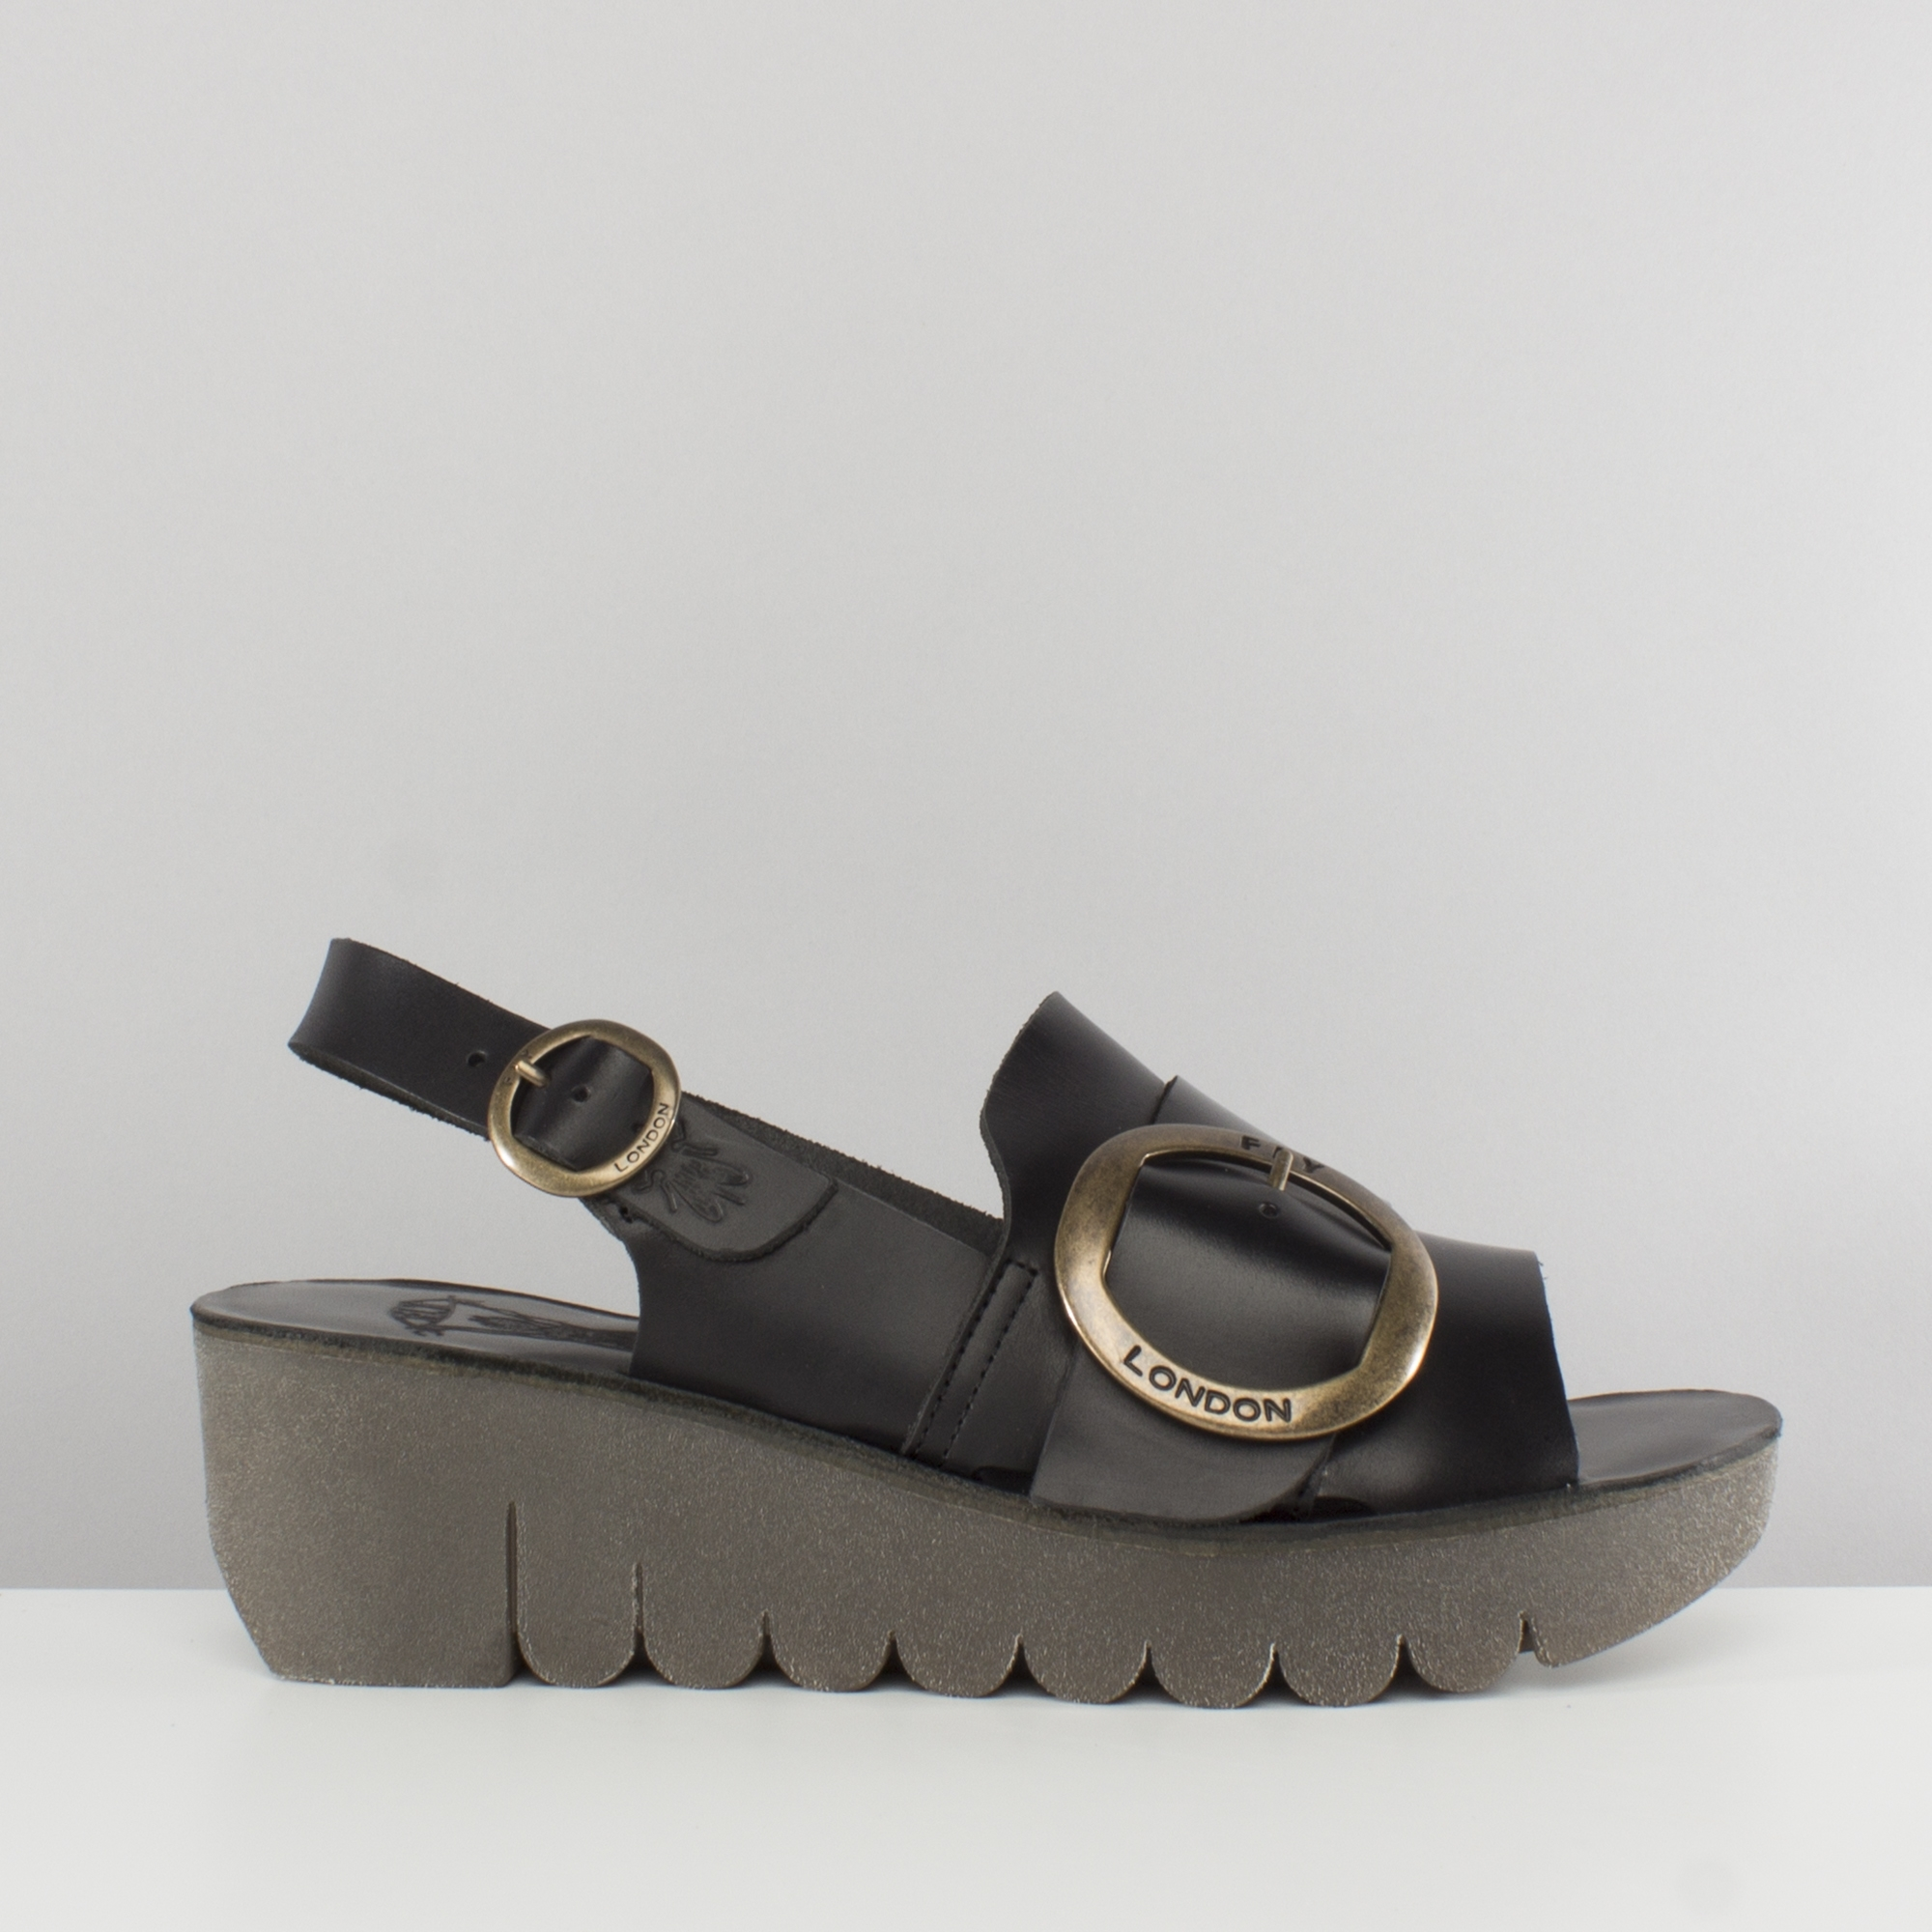 Yidi190fly Sandals Back Black Ladies London Sling Wedge Fly jVGLUMqpSz